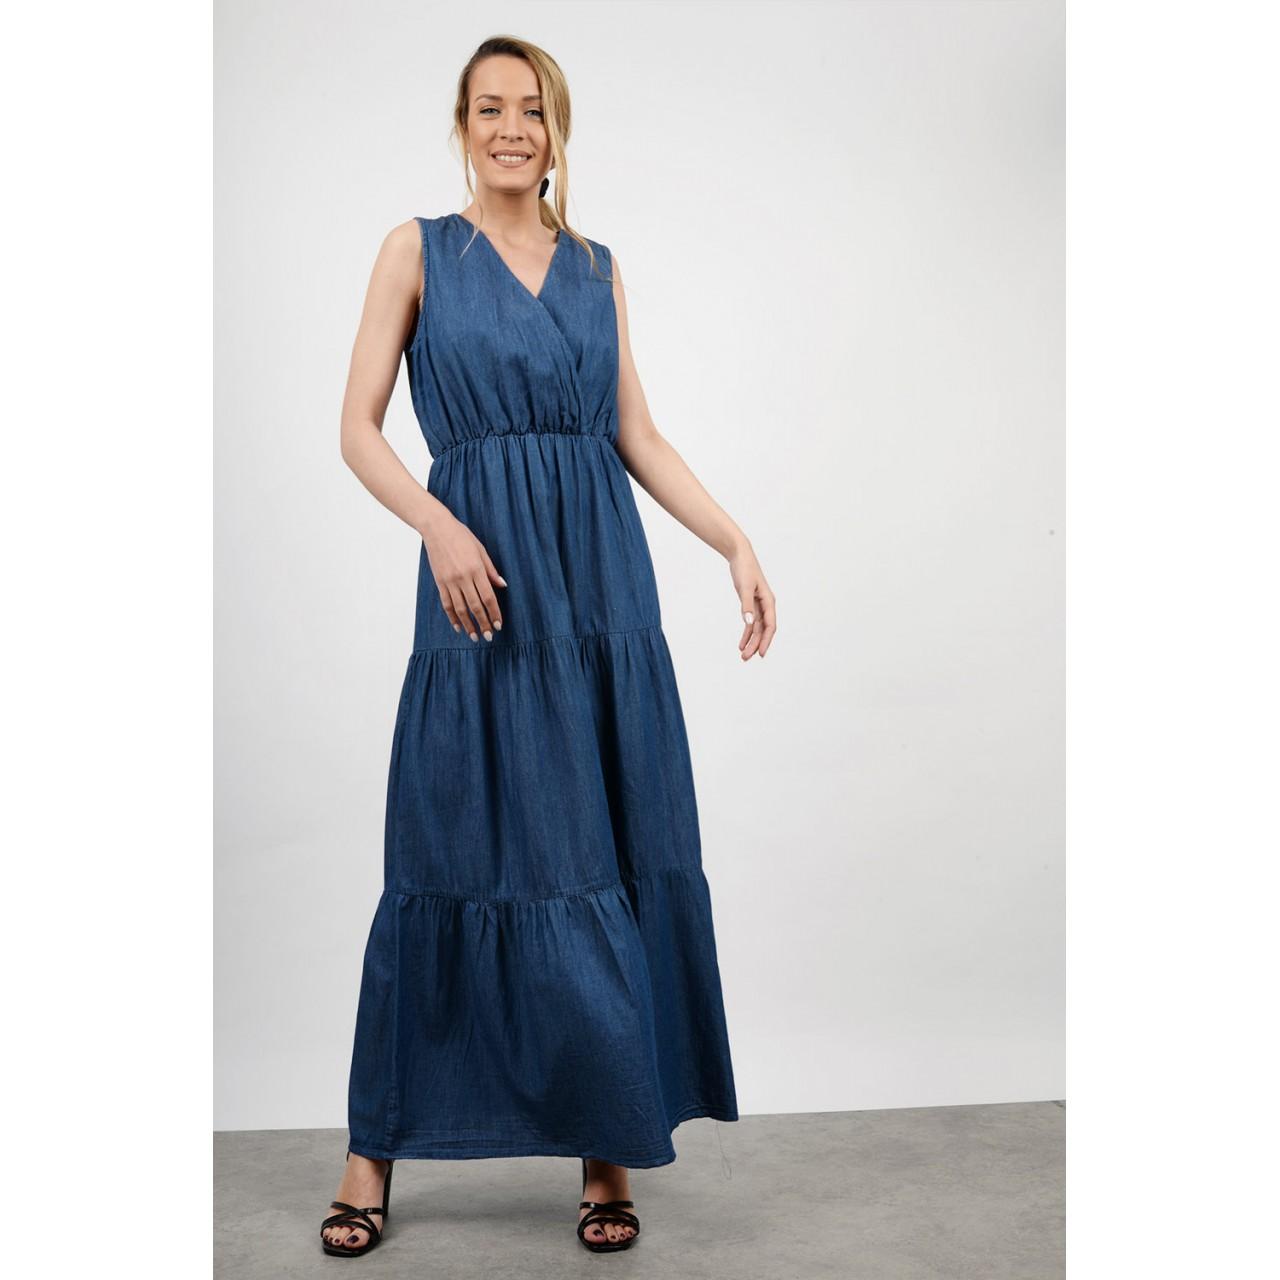 Sleevless maxi jean dress